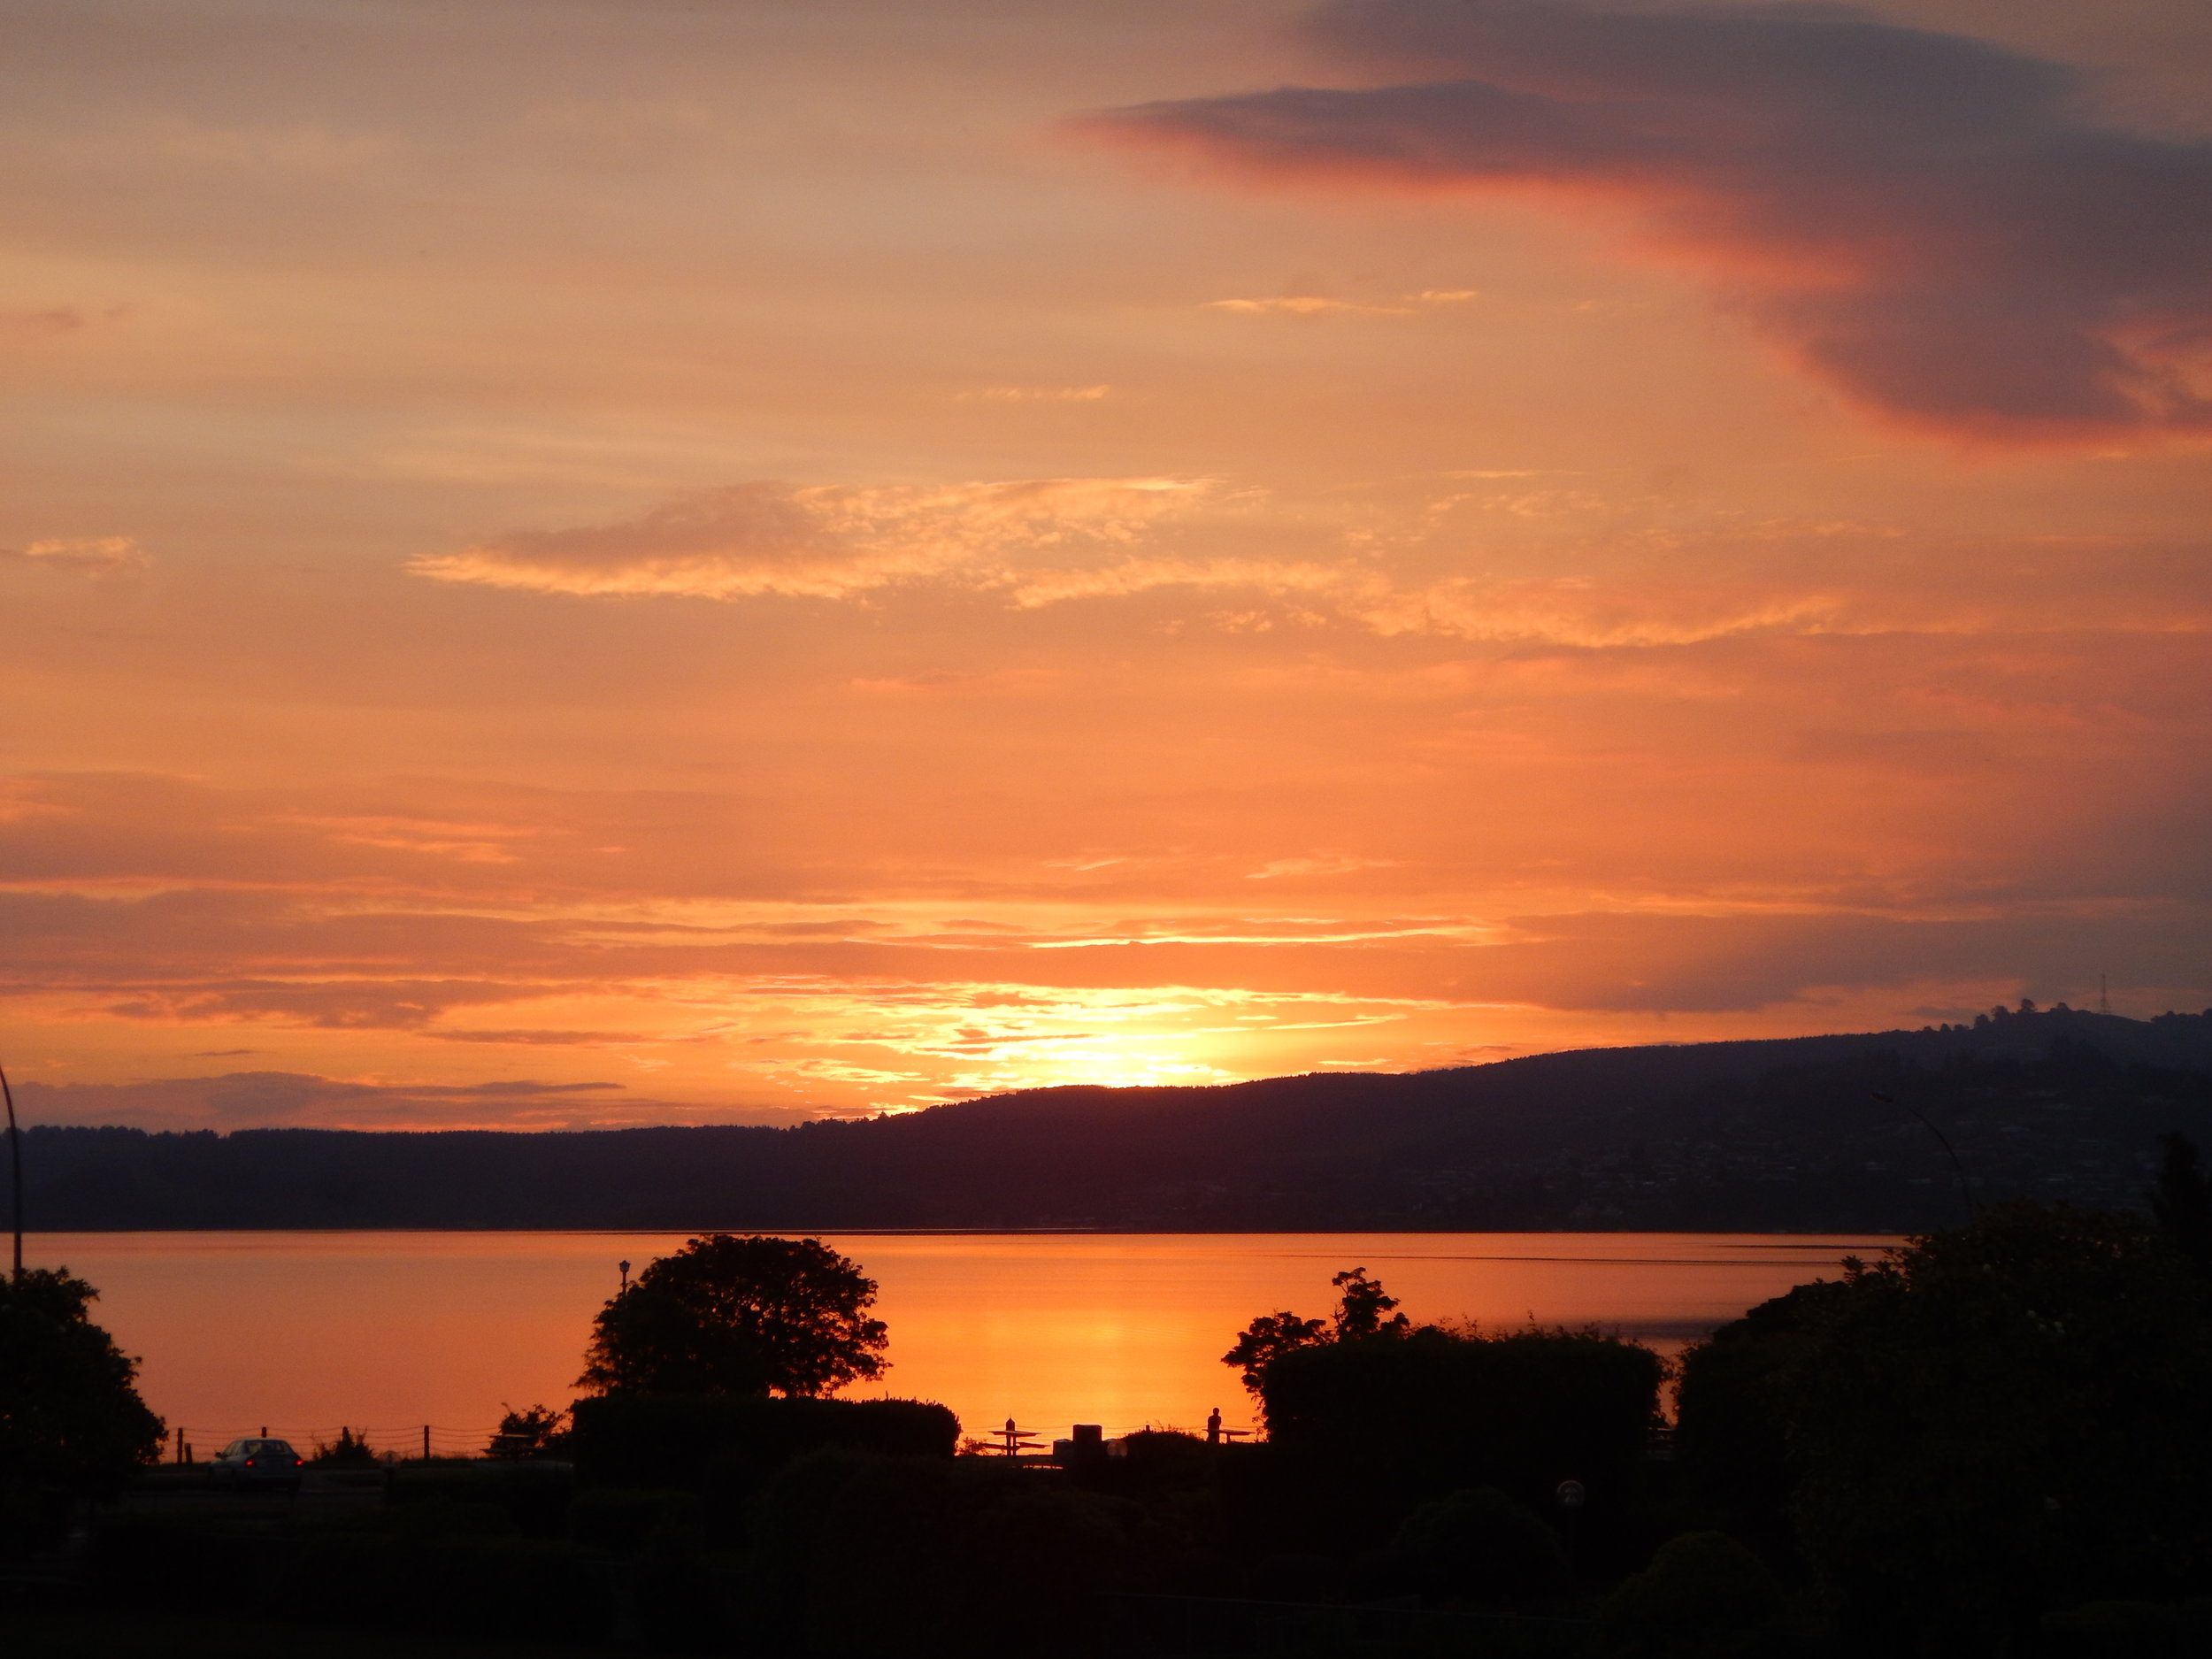 Sunset over Lake Taupo.